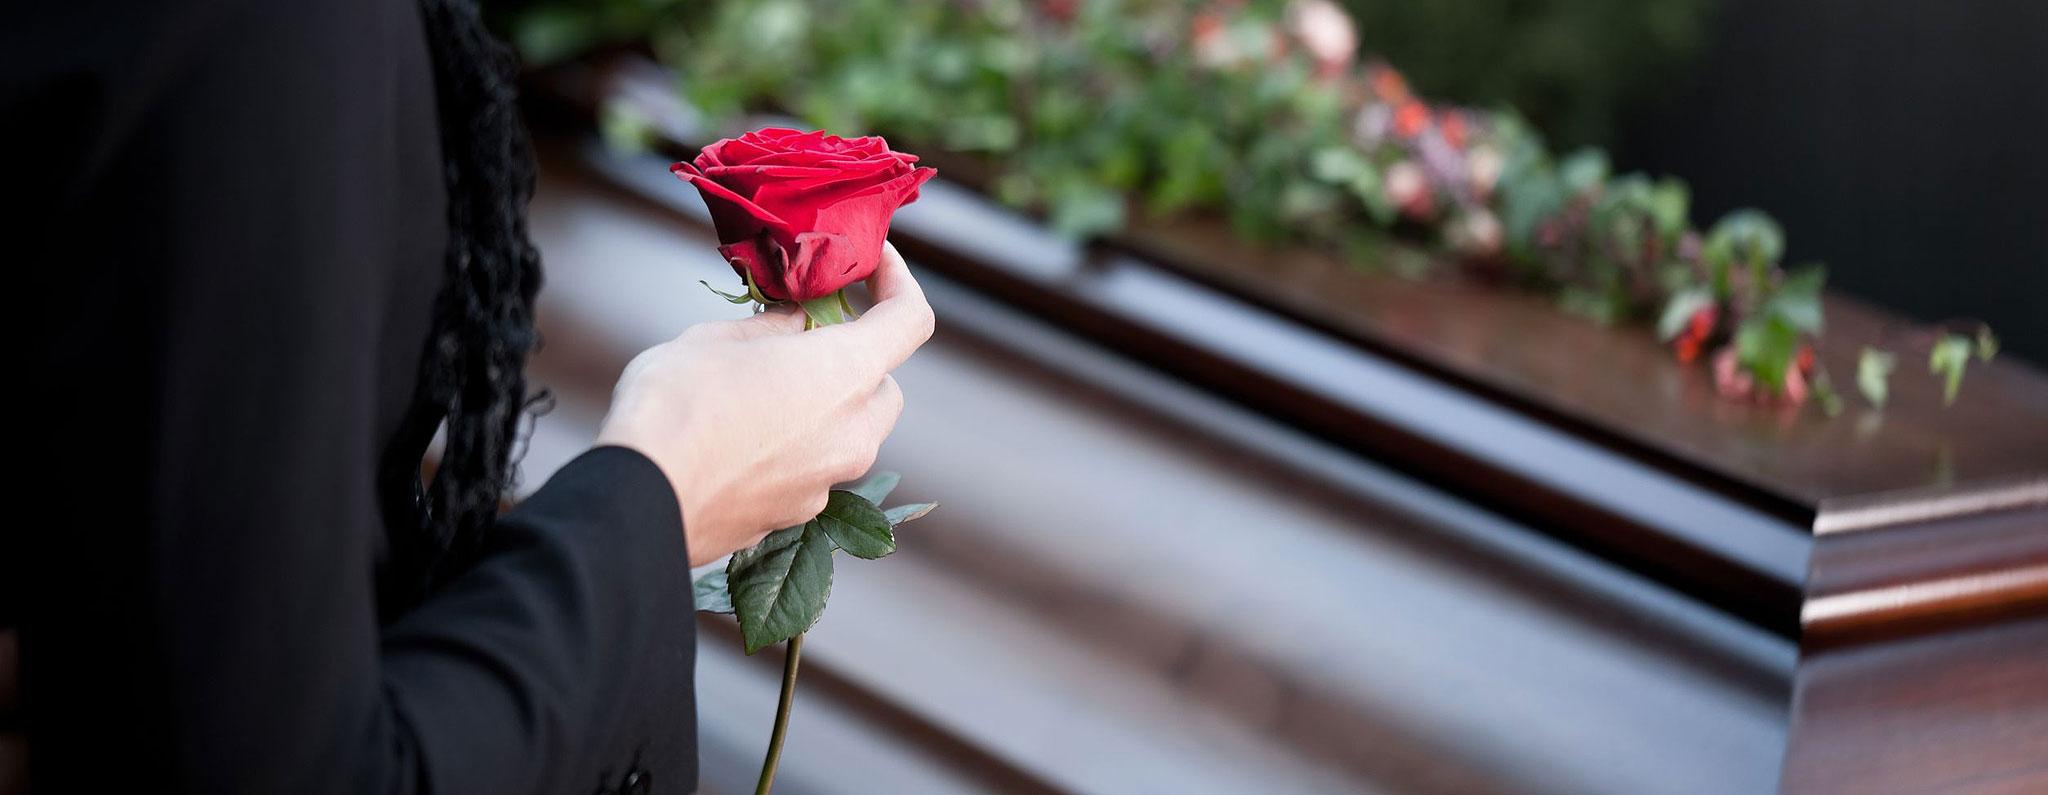 Funeral directors swansea, undertakers swansea, funerals swansea, Sims & Jones, Sims & Jones Swansea,